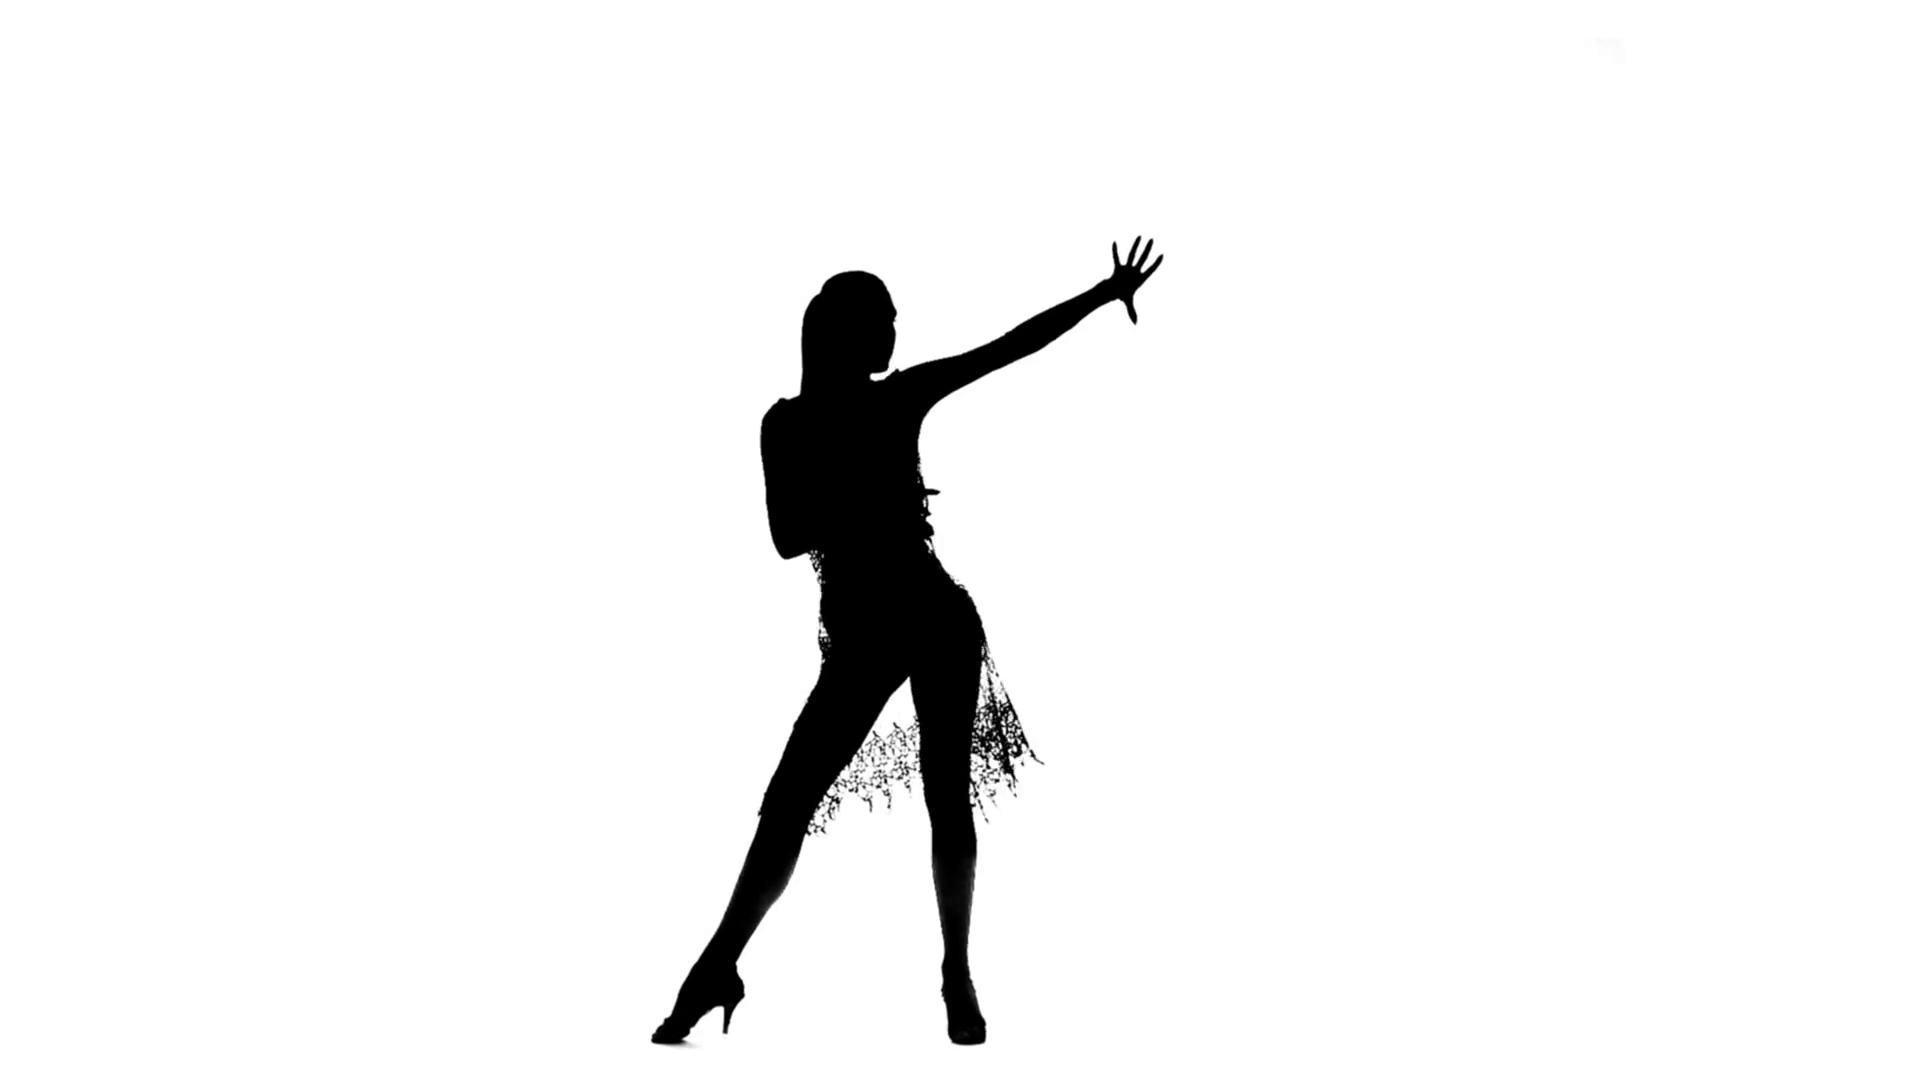 1920x1080 Woman Solo Dancing Elements Of Ballroom Dancing. Black Silhouette